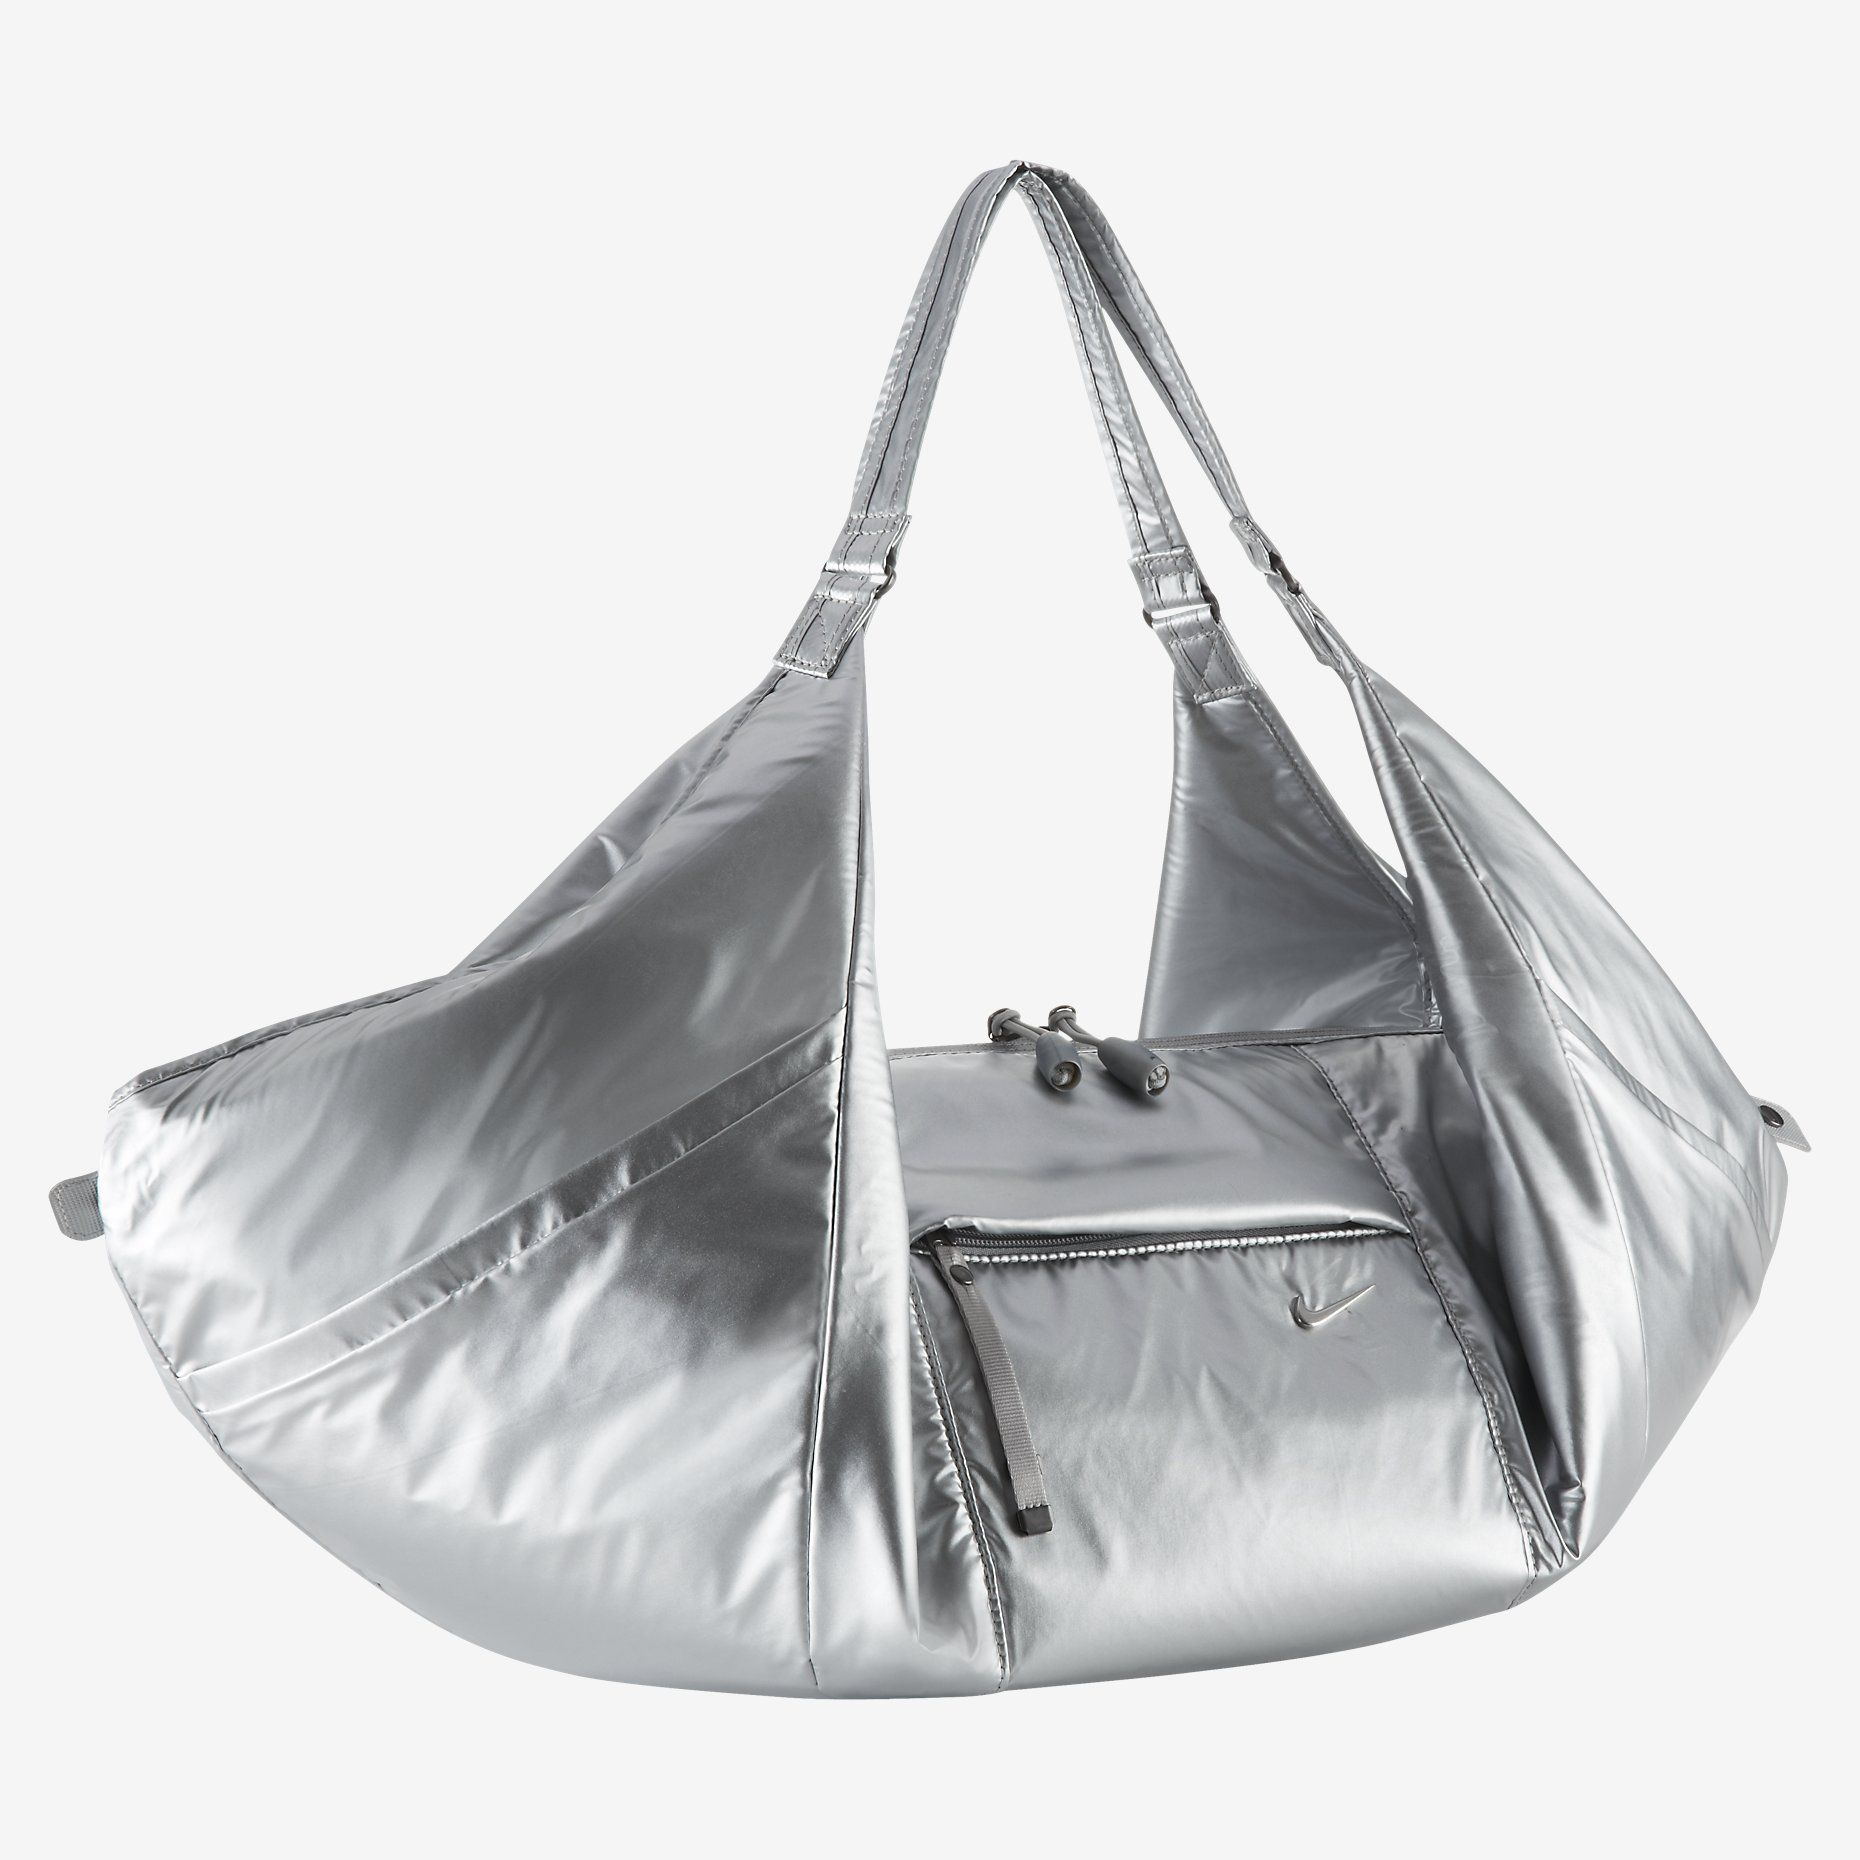 Nike Victory Metallic Gym Tote Bag BA5009 013 A